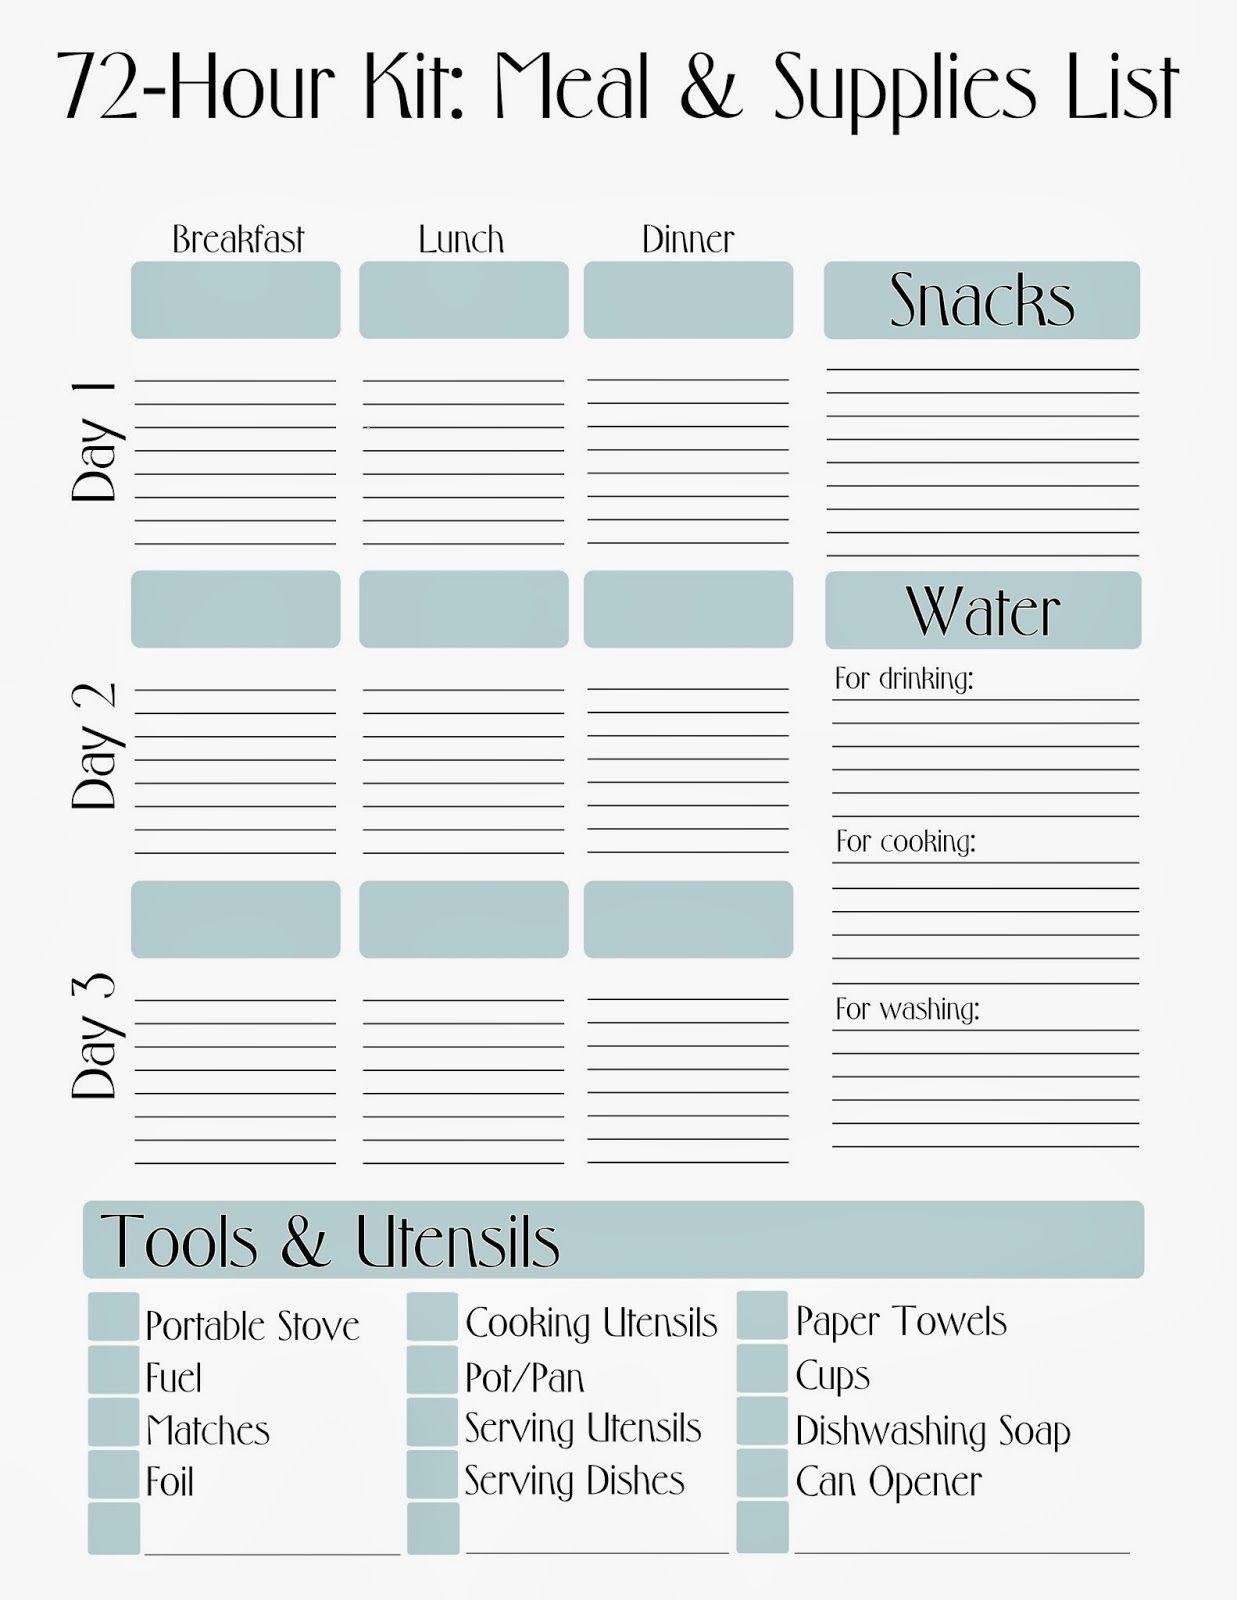 Free Printable Worksheet For 72 Hour Food Kit Super Easy